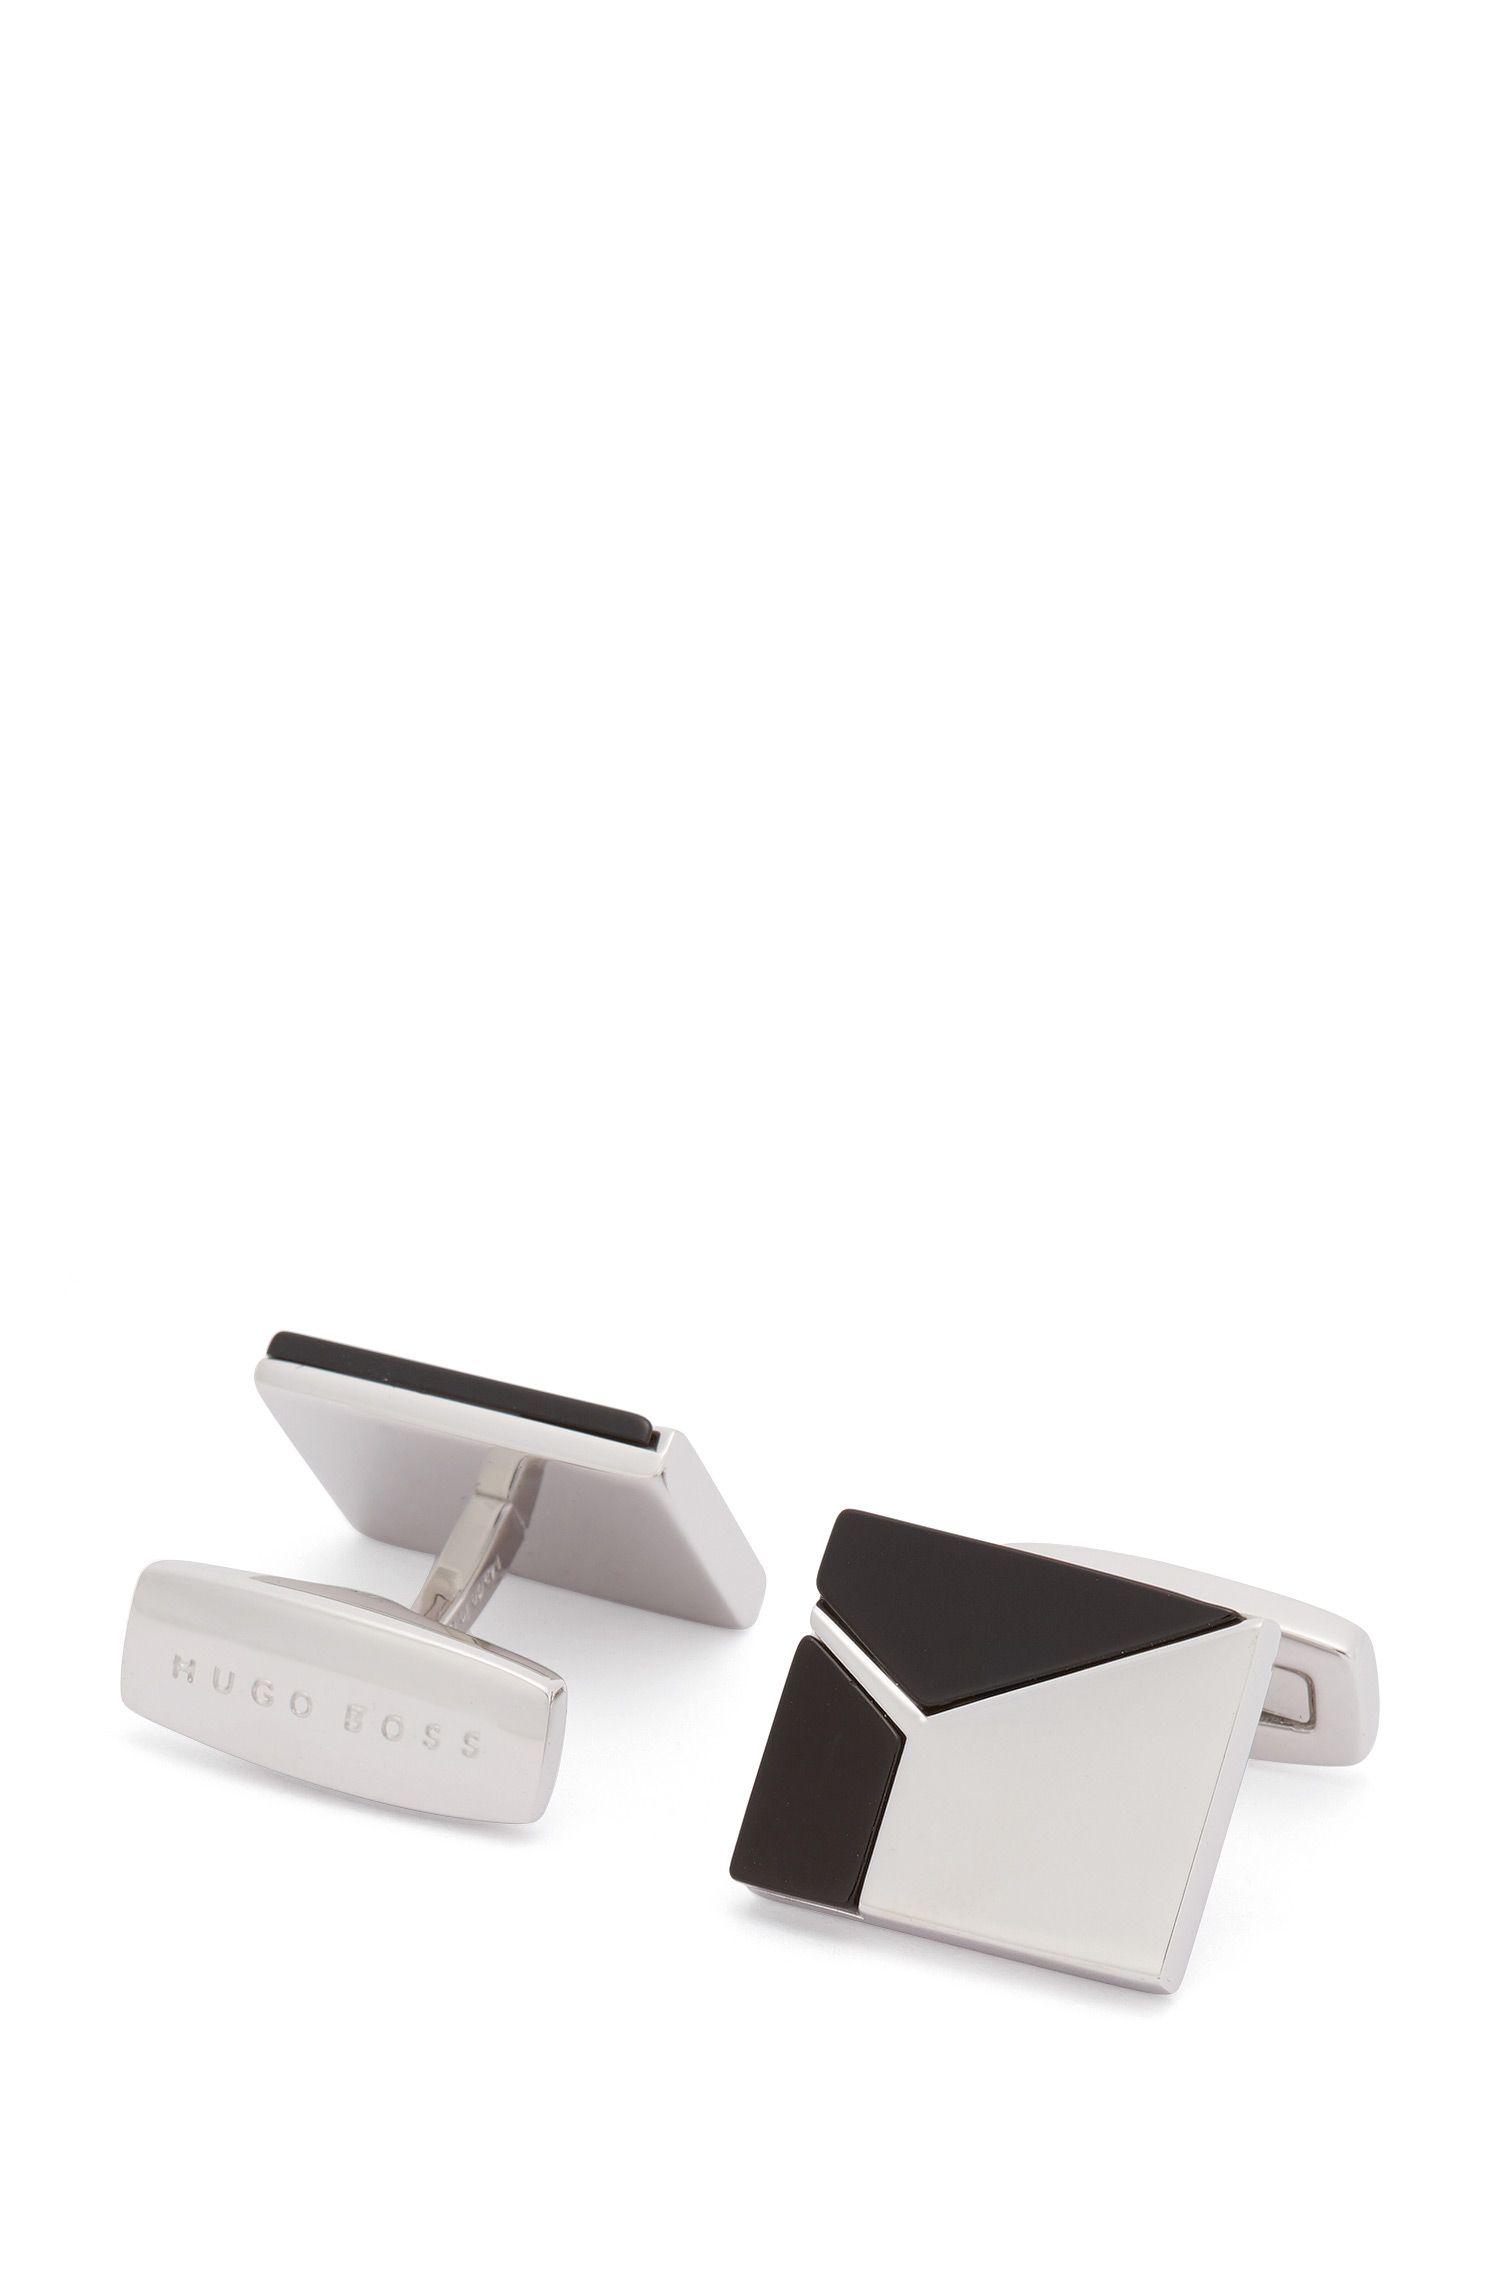 Square cufflinks with geometric onyx inserts